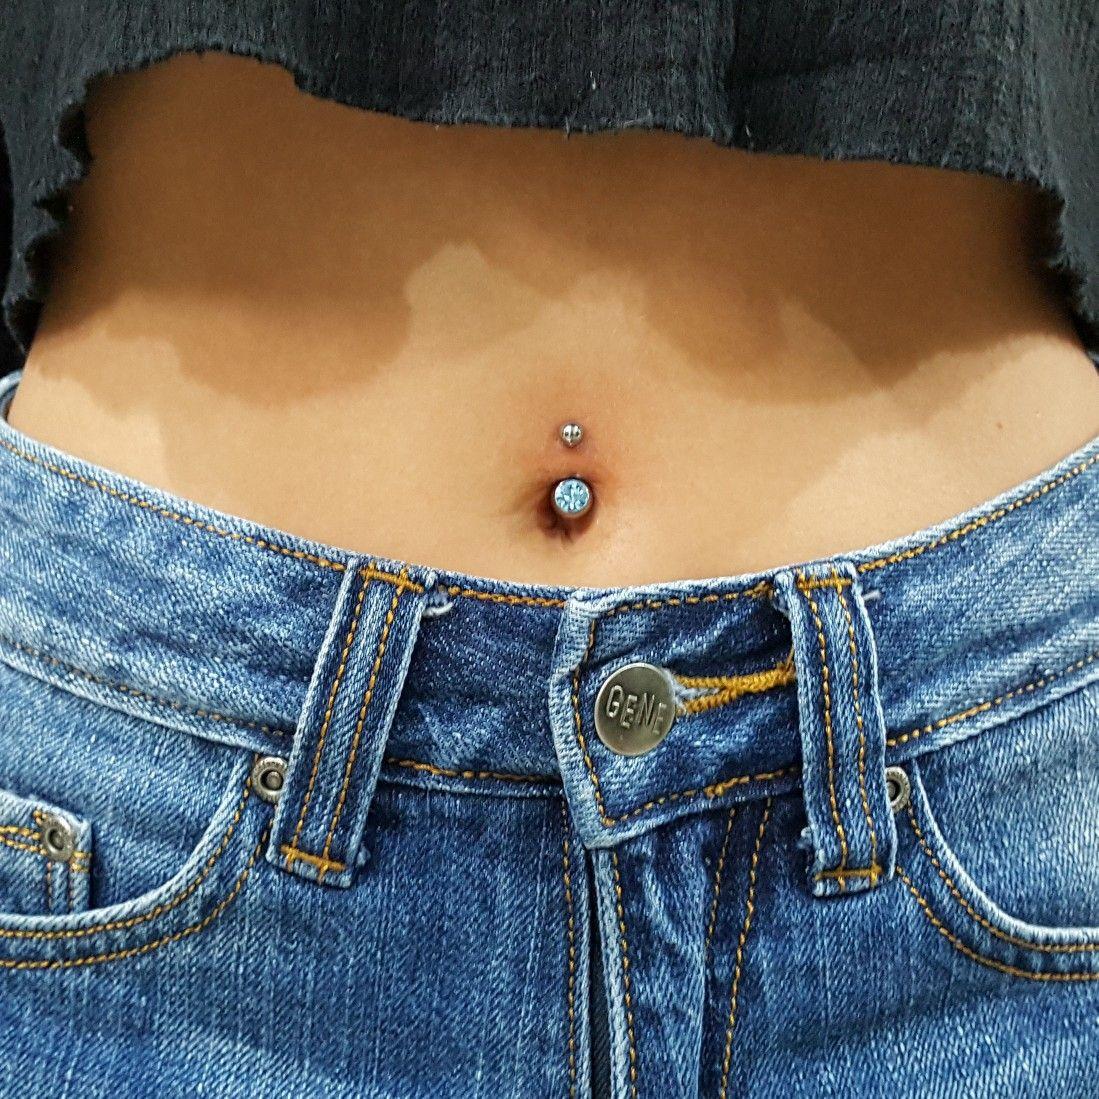 Belly piercing 2018  Pin by jess  on p i e r c i n g s in   Pinterest  Piercings